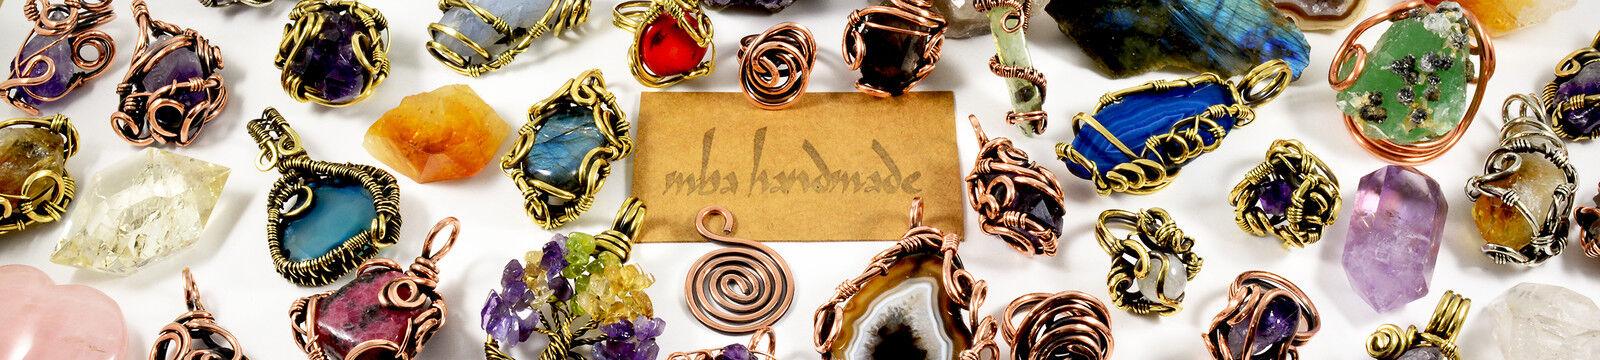 Mba Handmade